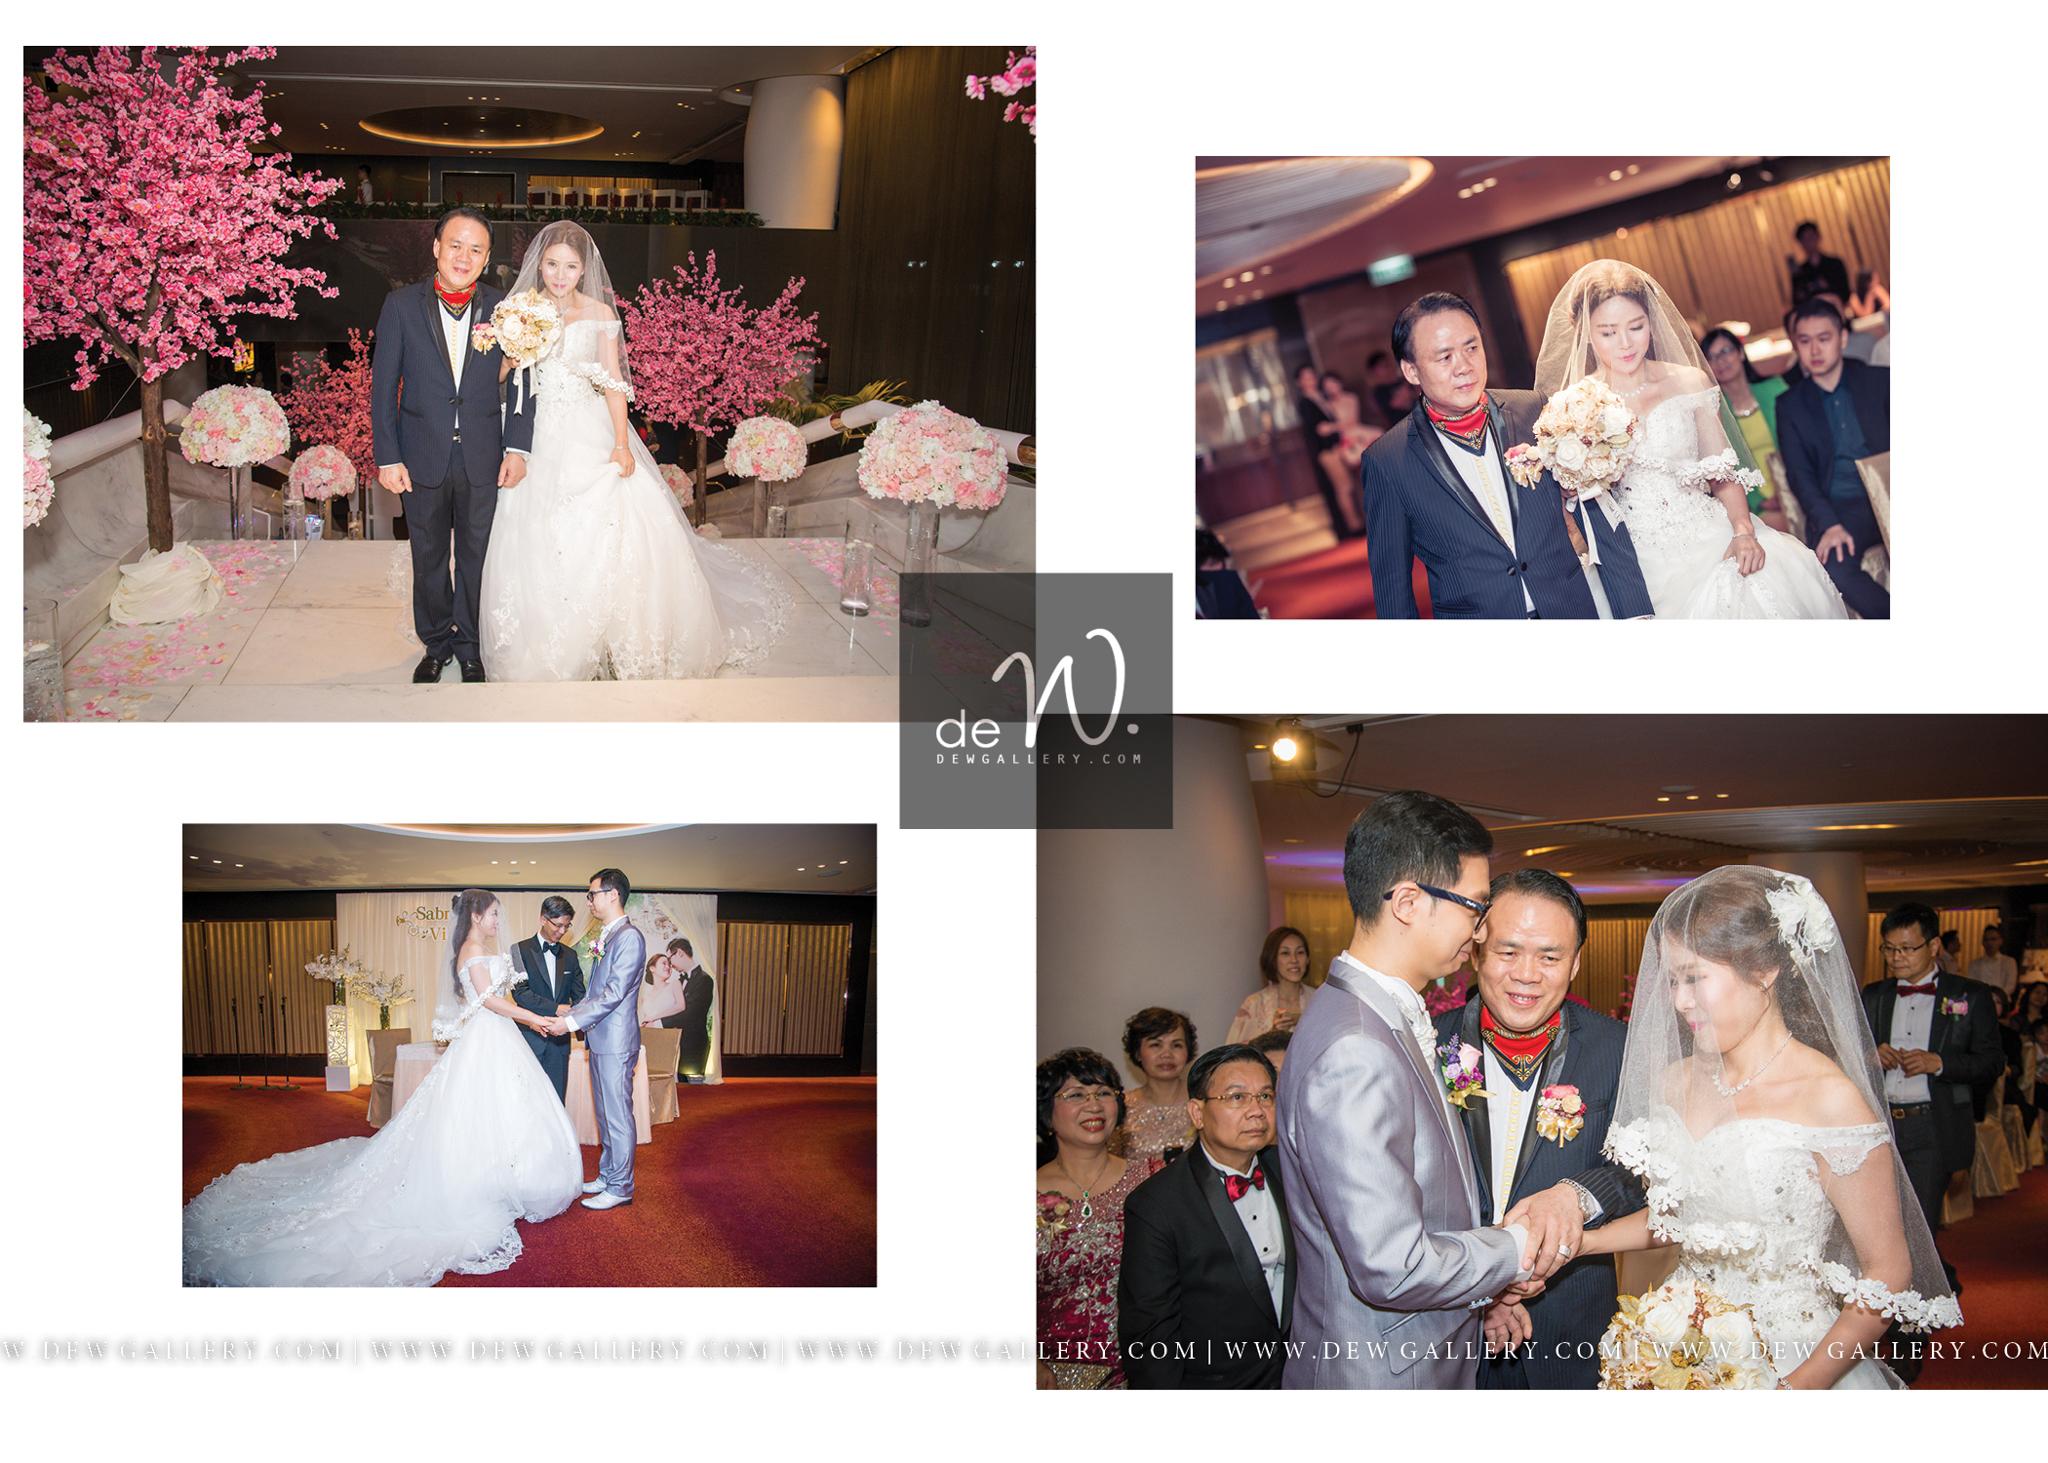 Sabrina & Vincent Wedding Day Album25